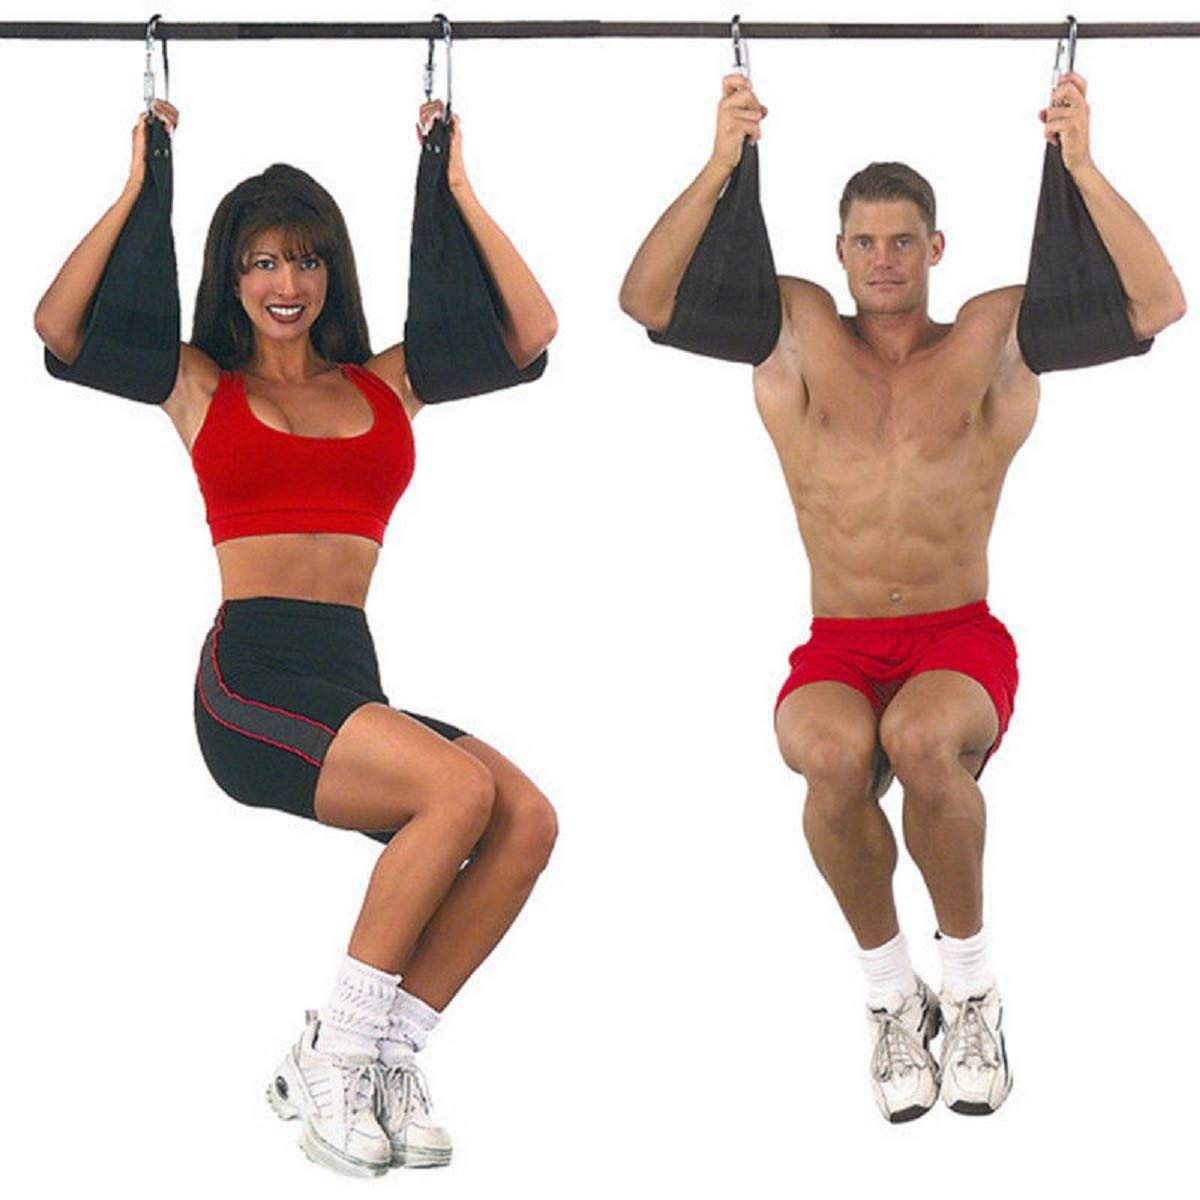 Flytool Ab Straps Core Exercise Equipment Training Gym Abdominal Hanging Straps, Black by Flytool (Image #1)